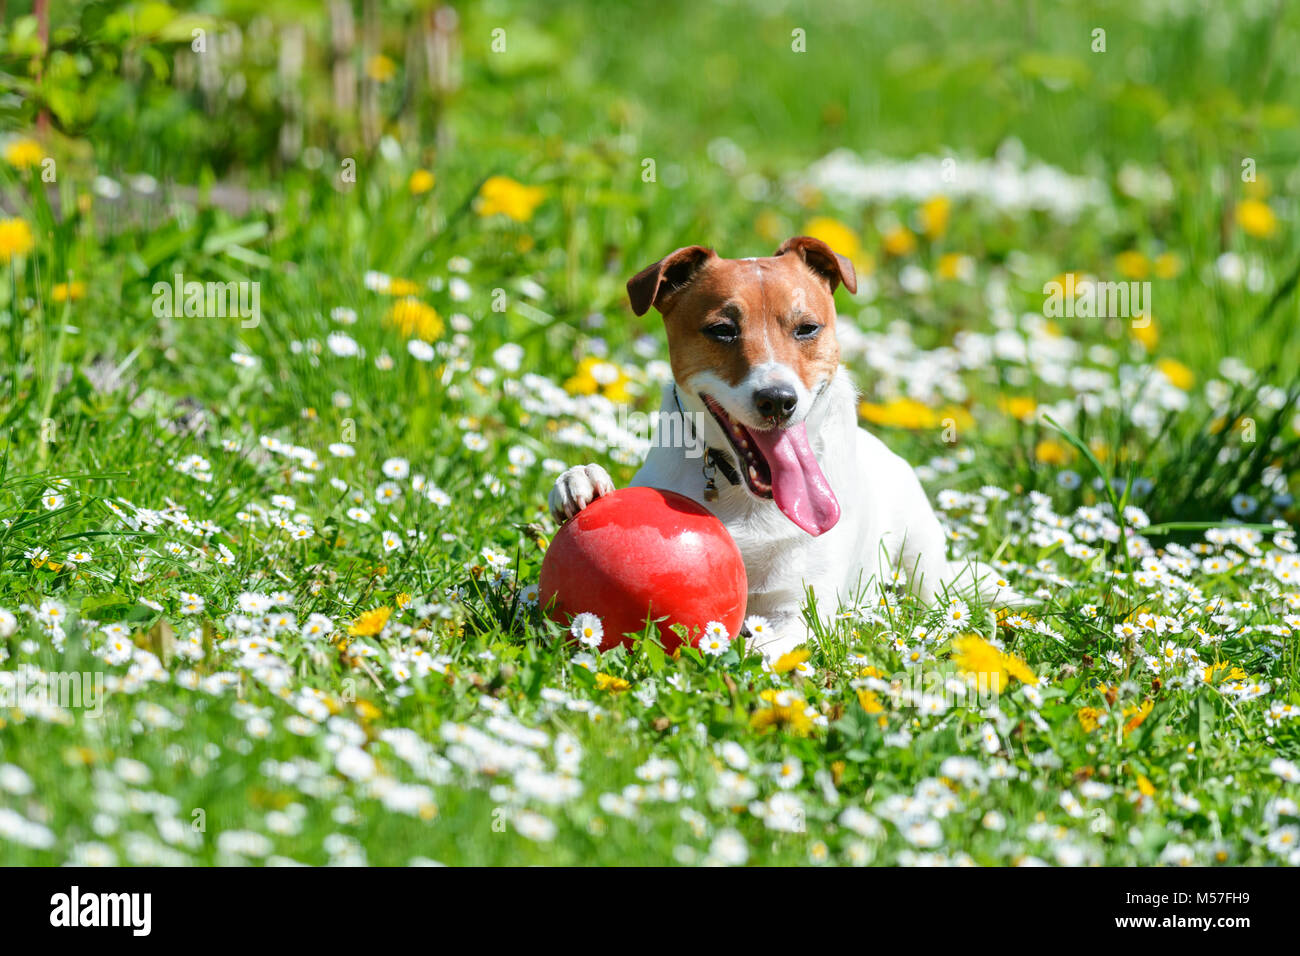 Jack russel terrier puppy on flower meadow - Stock Image